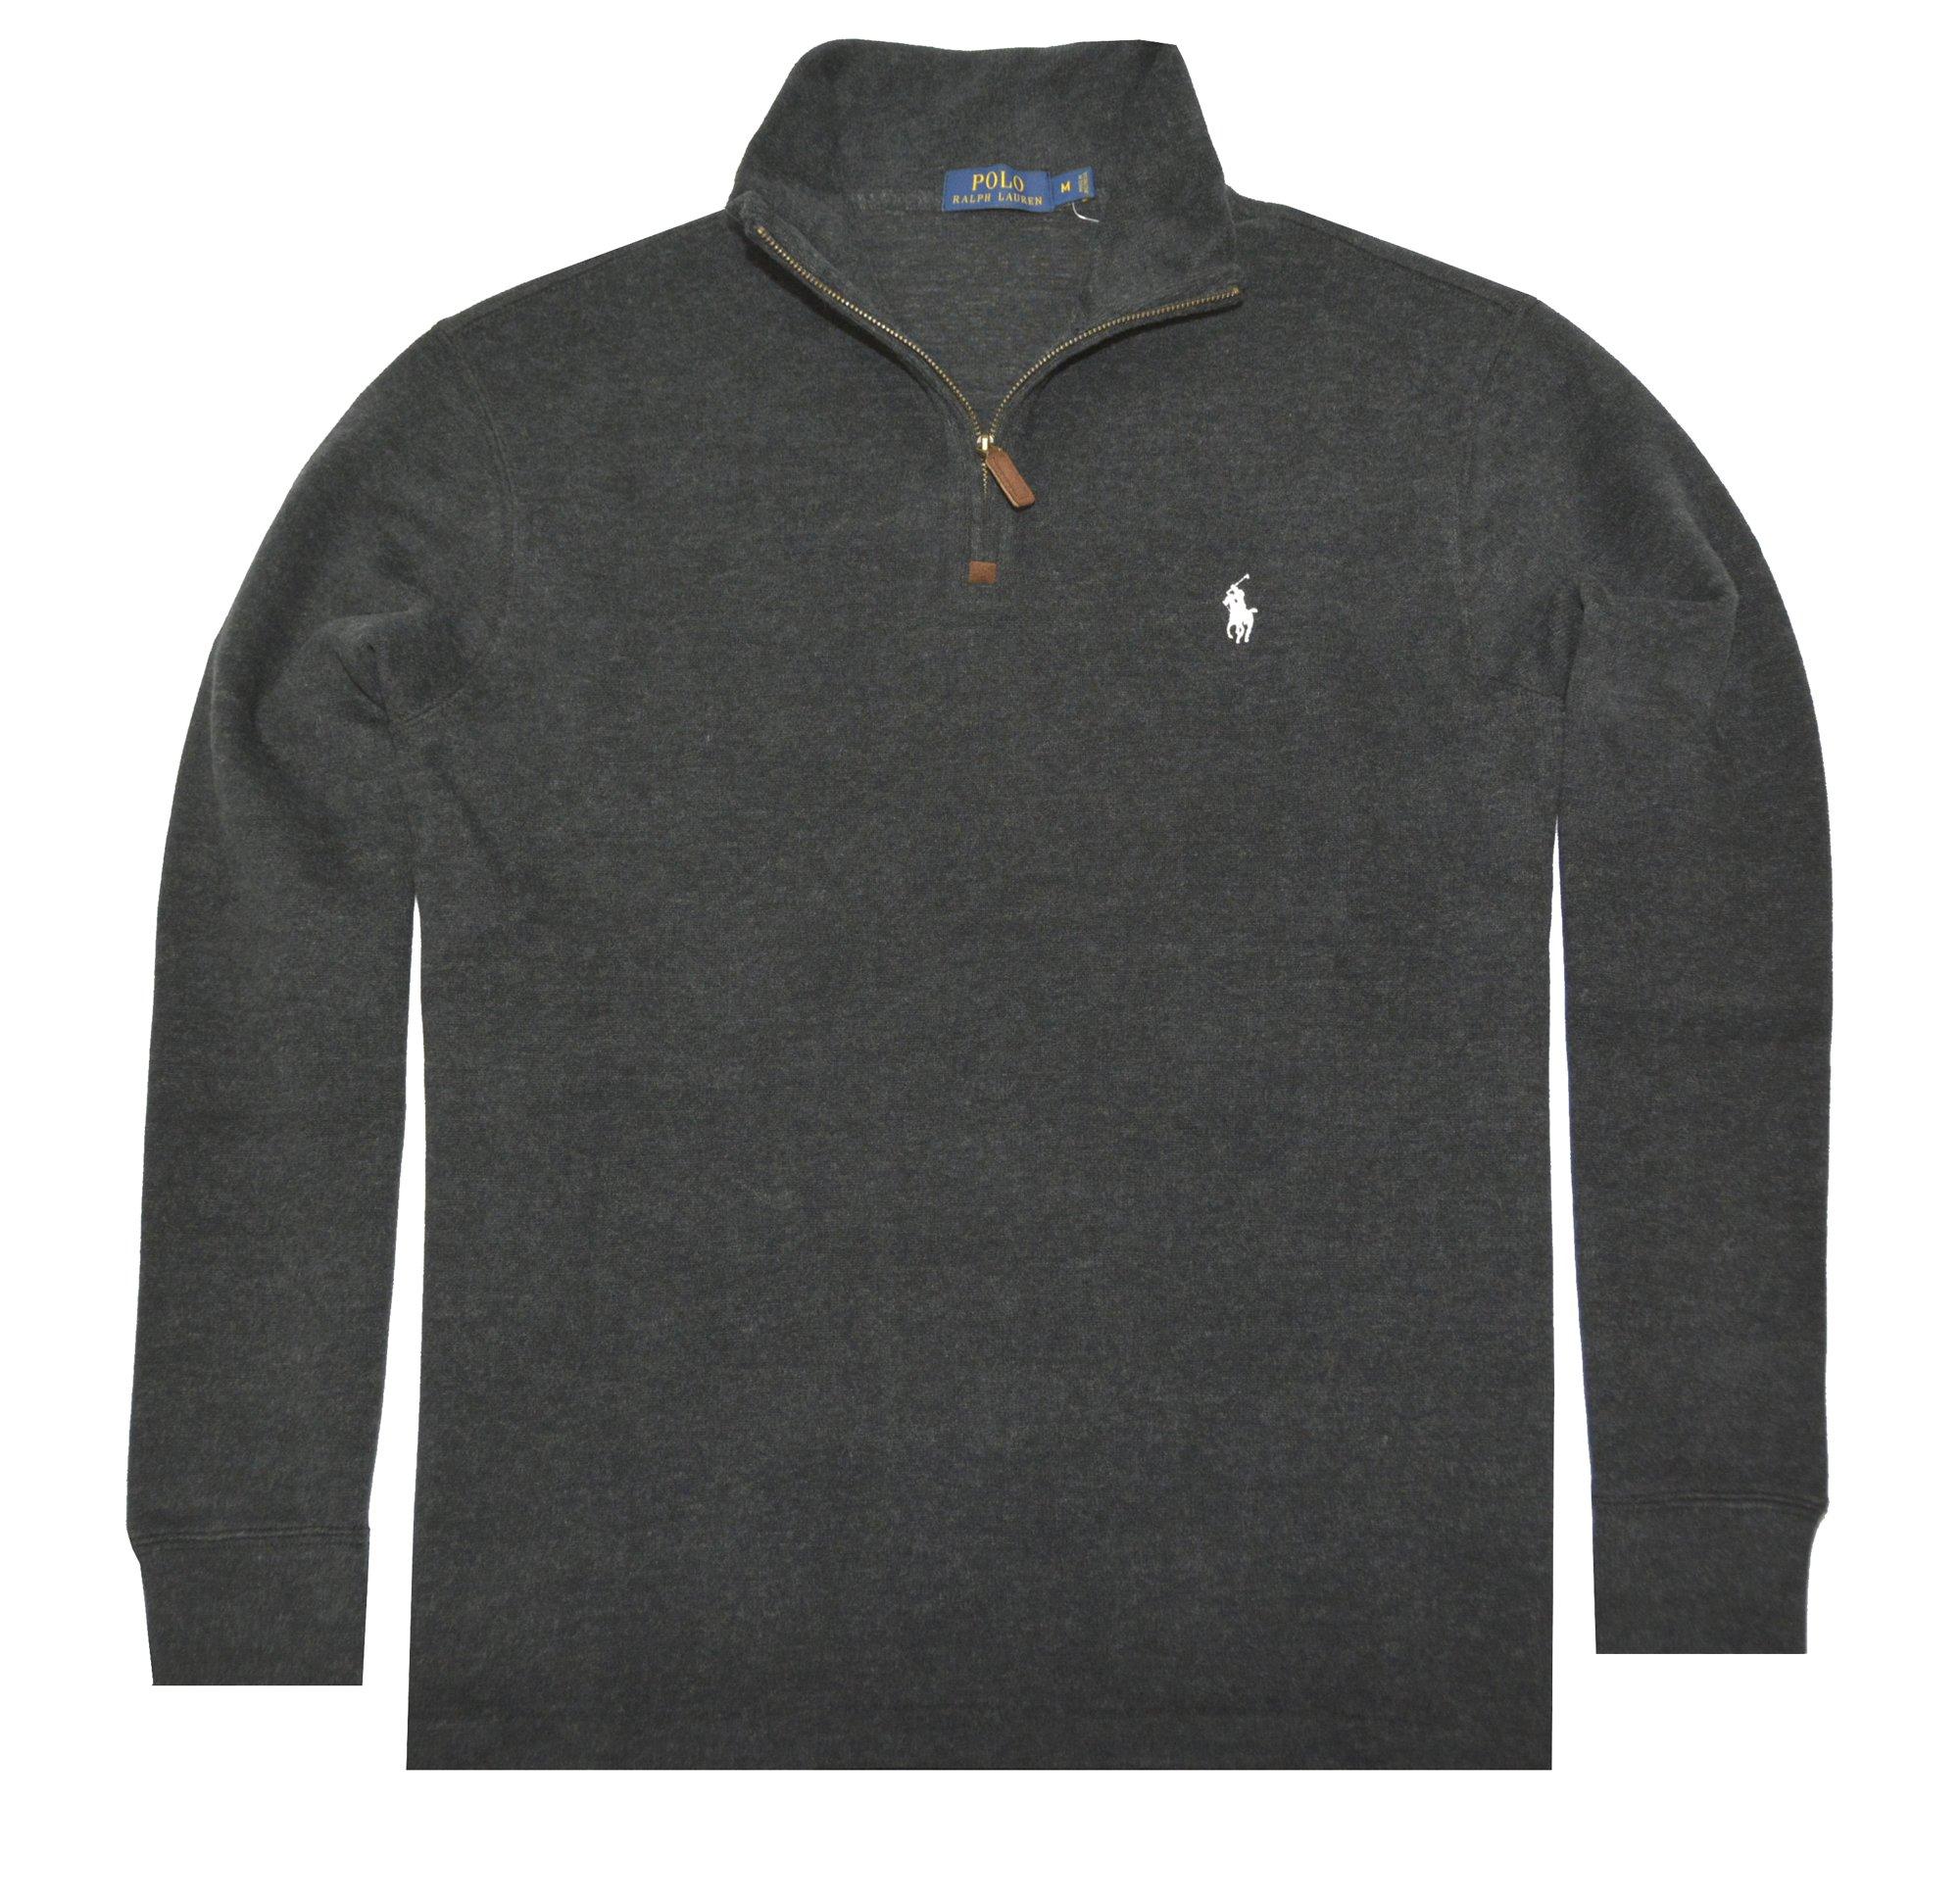 Polo Ralph Lauren Mens Half Zip French Rib Cotton Sweater (Black White Pony, Medium)